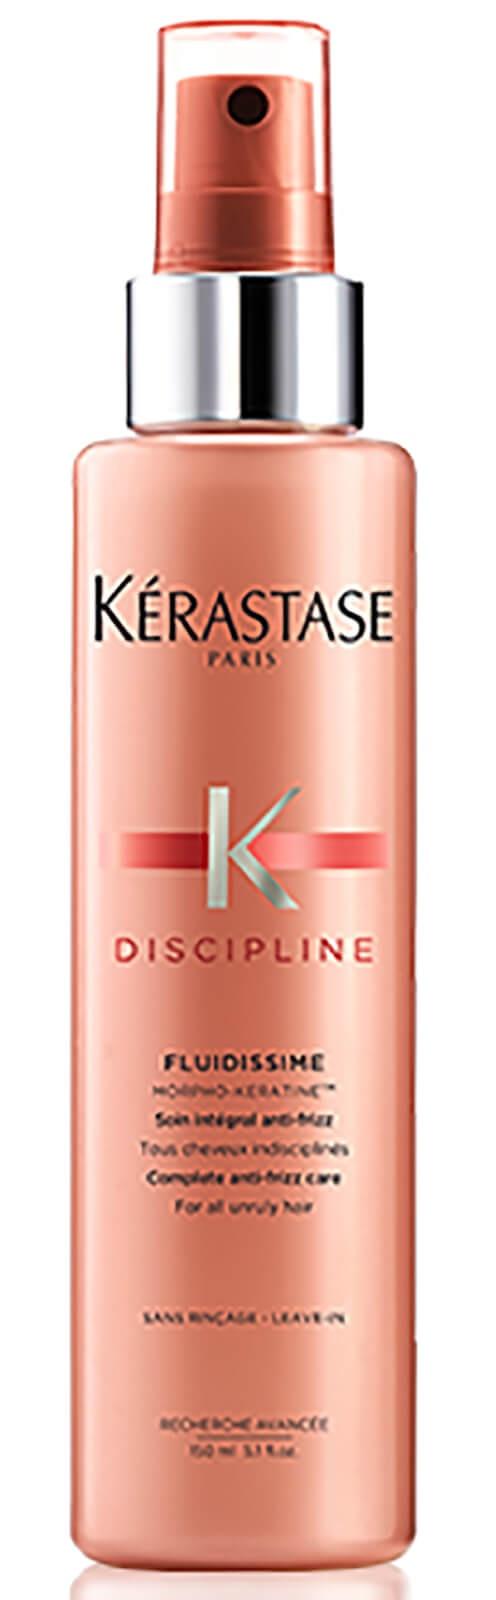 Kerastase Discipline Fluidissime Spray